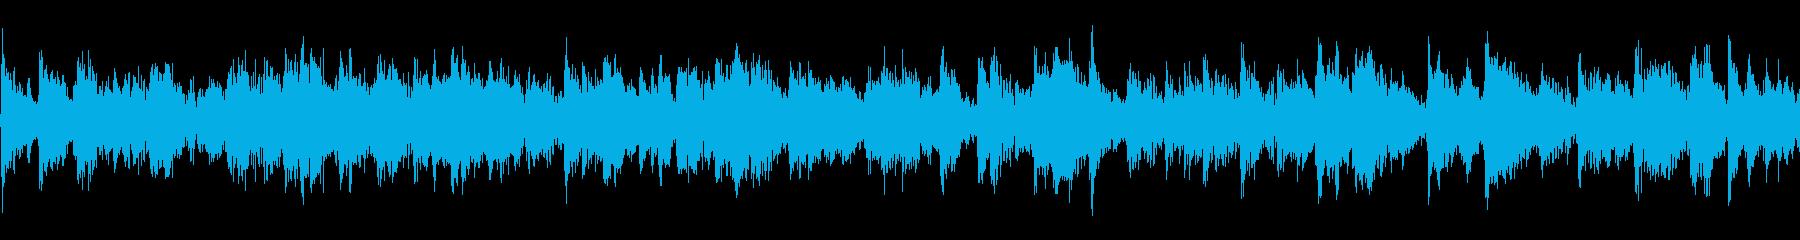 UFOキャッチャー音 【ループ】の再生済みの波形